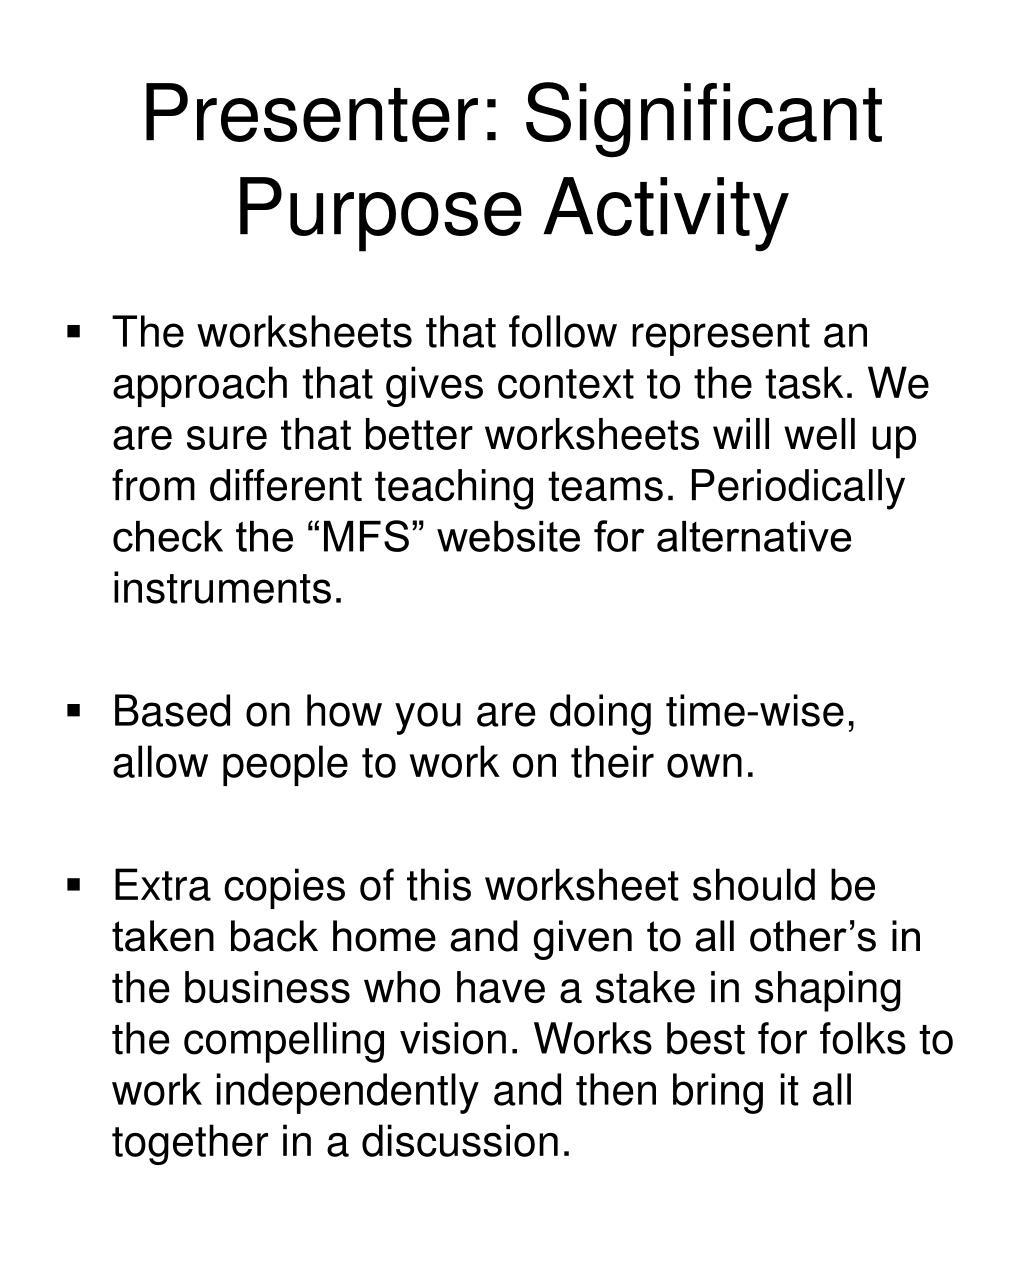 Presenter: Significant Purpose Activity